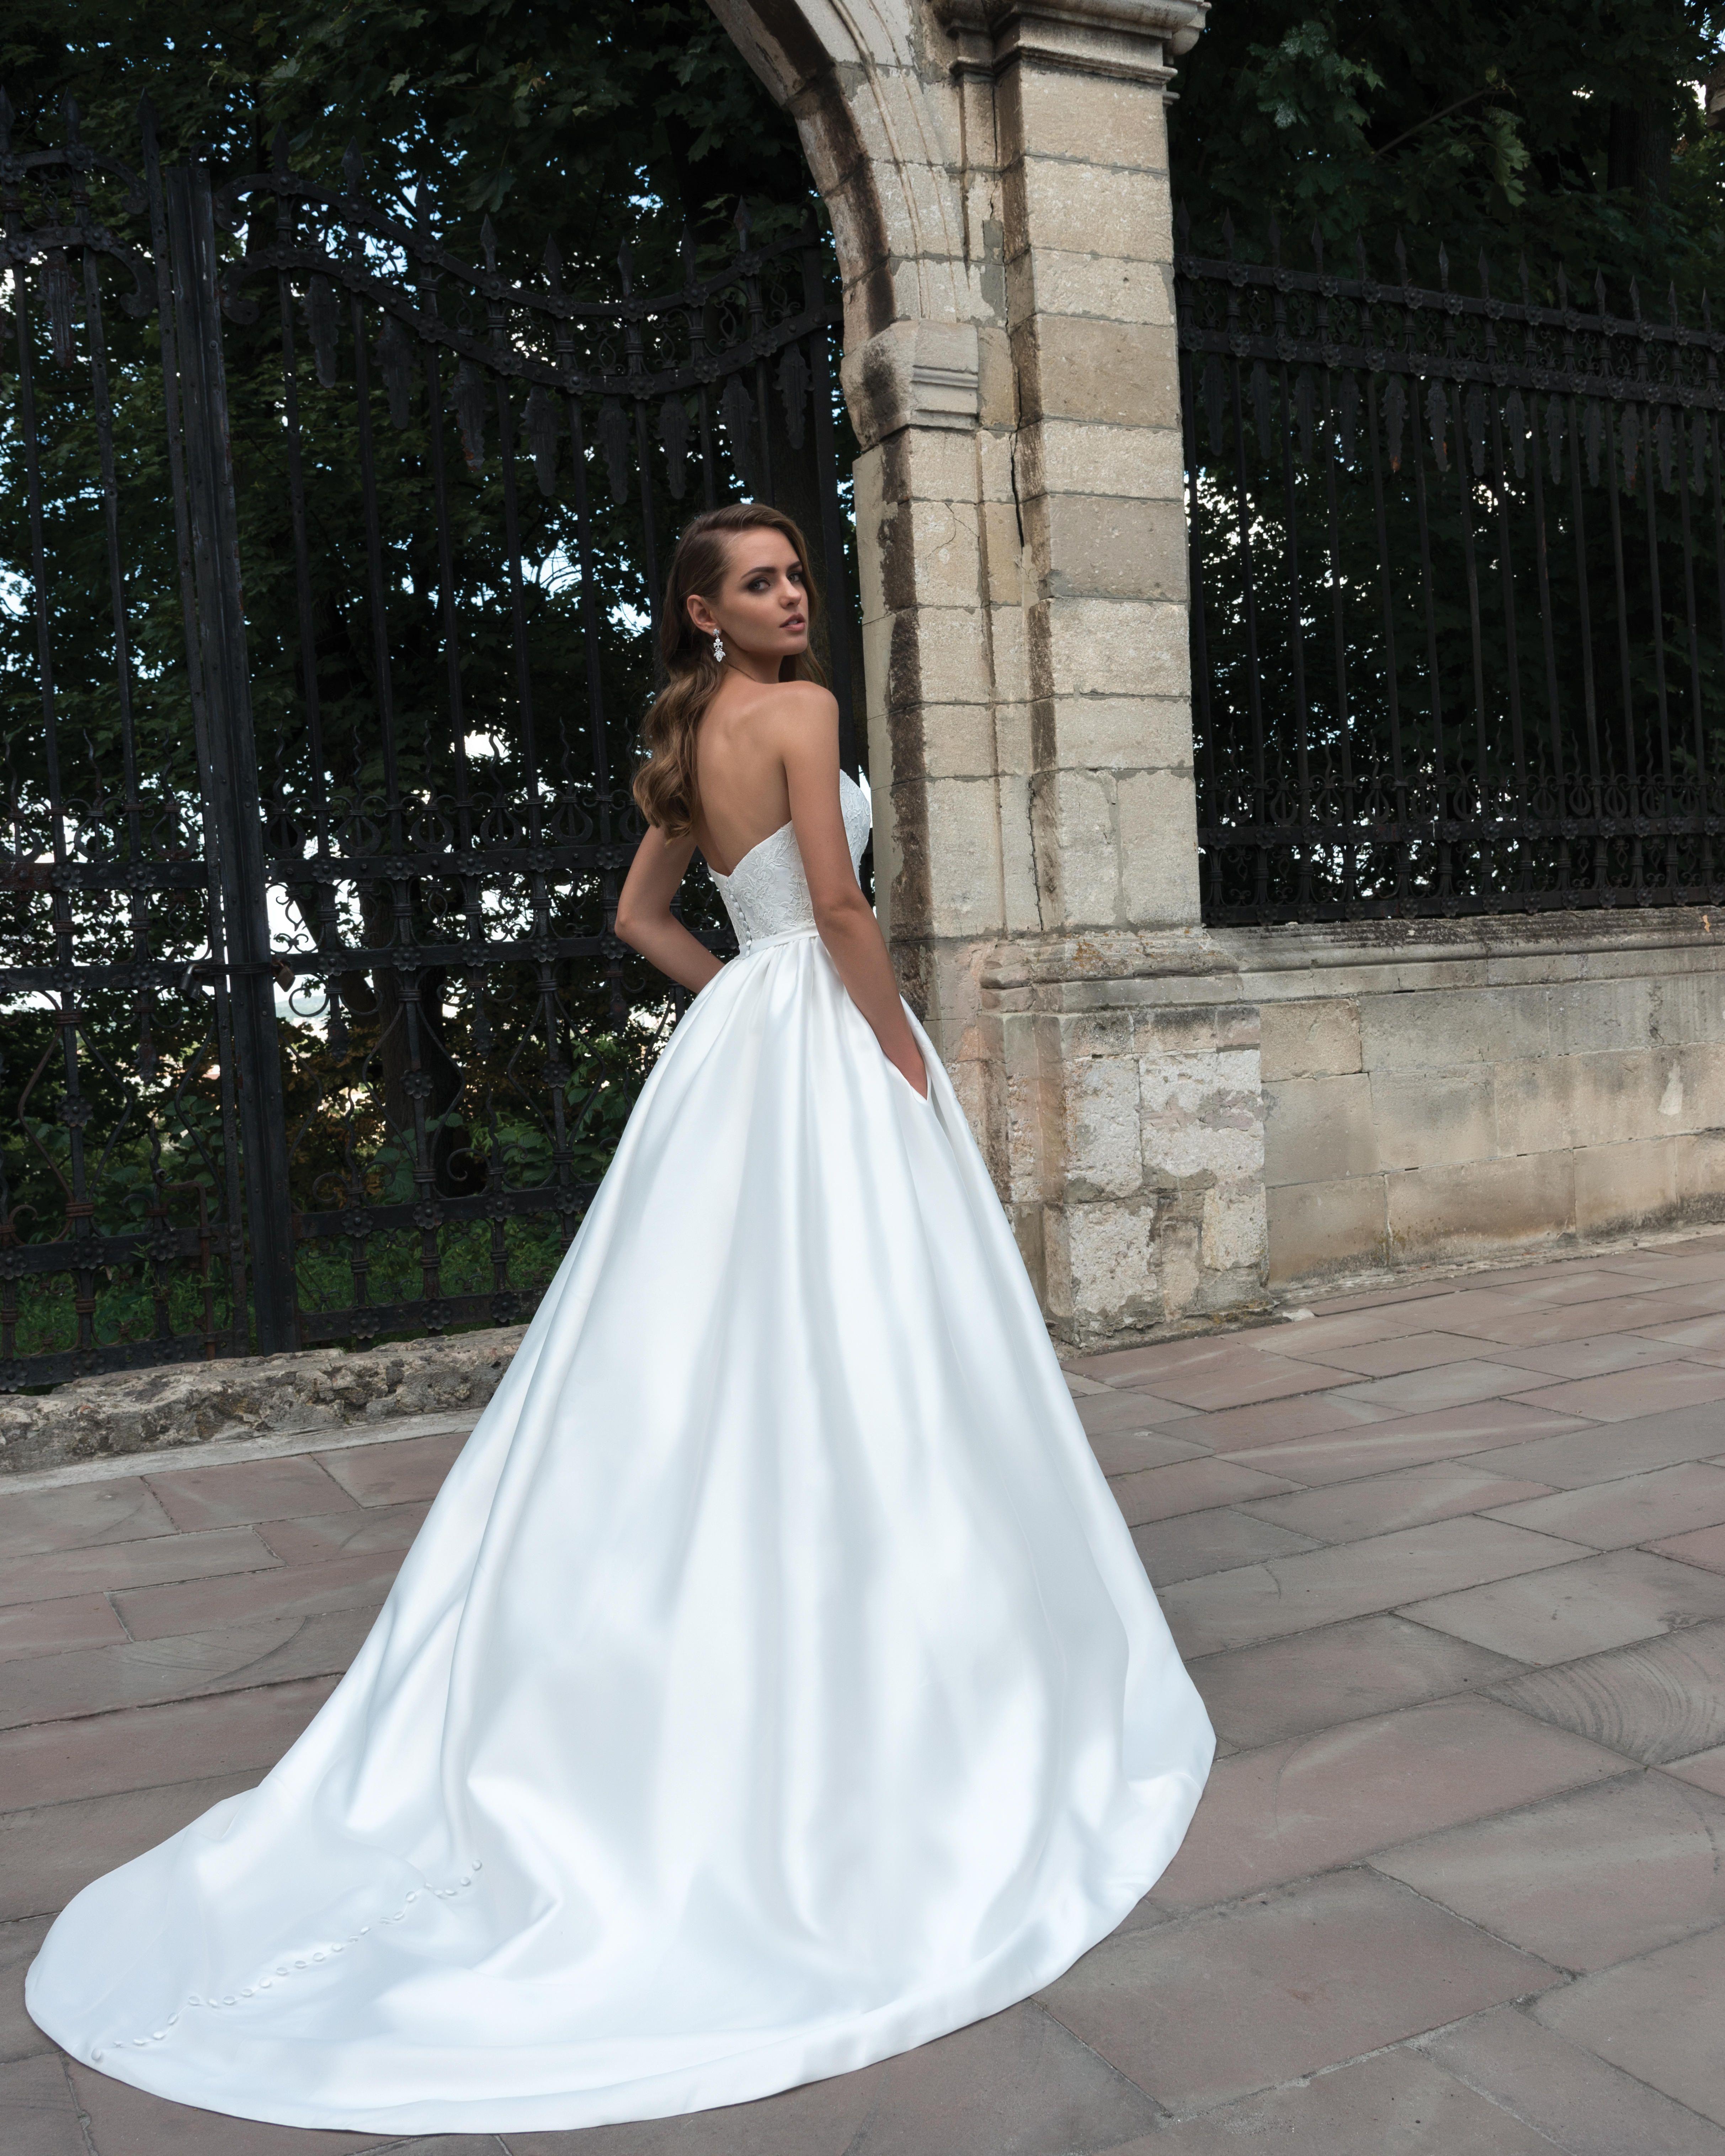 DERBY-Fashion Bride | Bridal Collection | Pinterest | Bridal collection